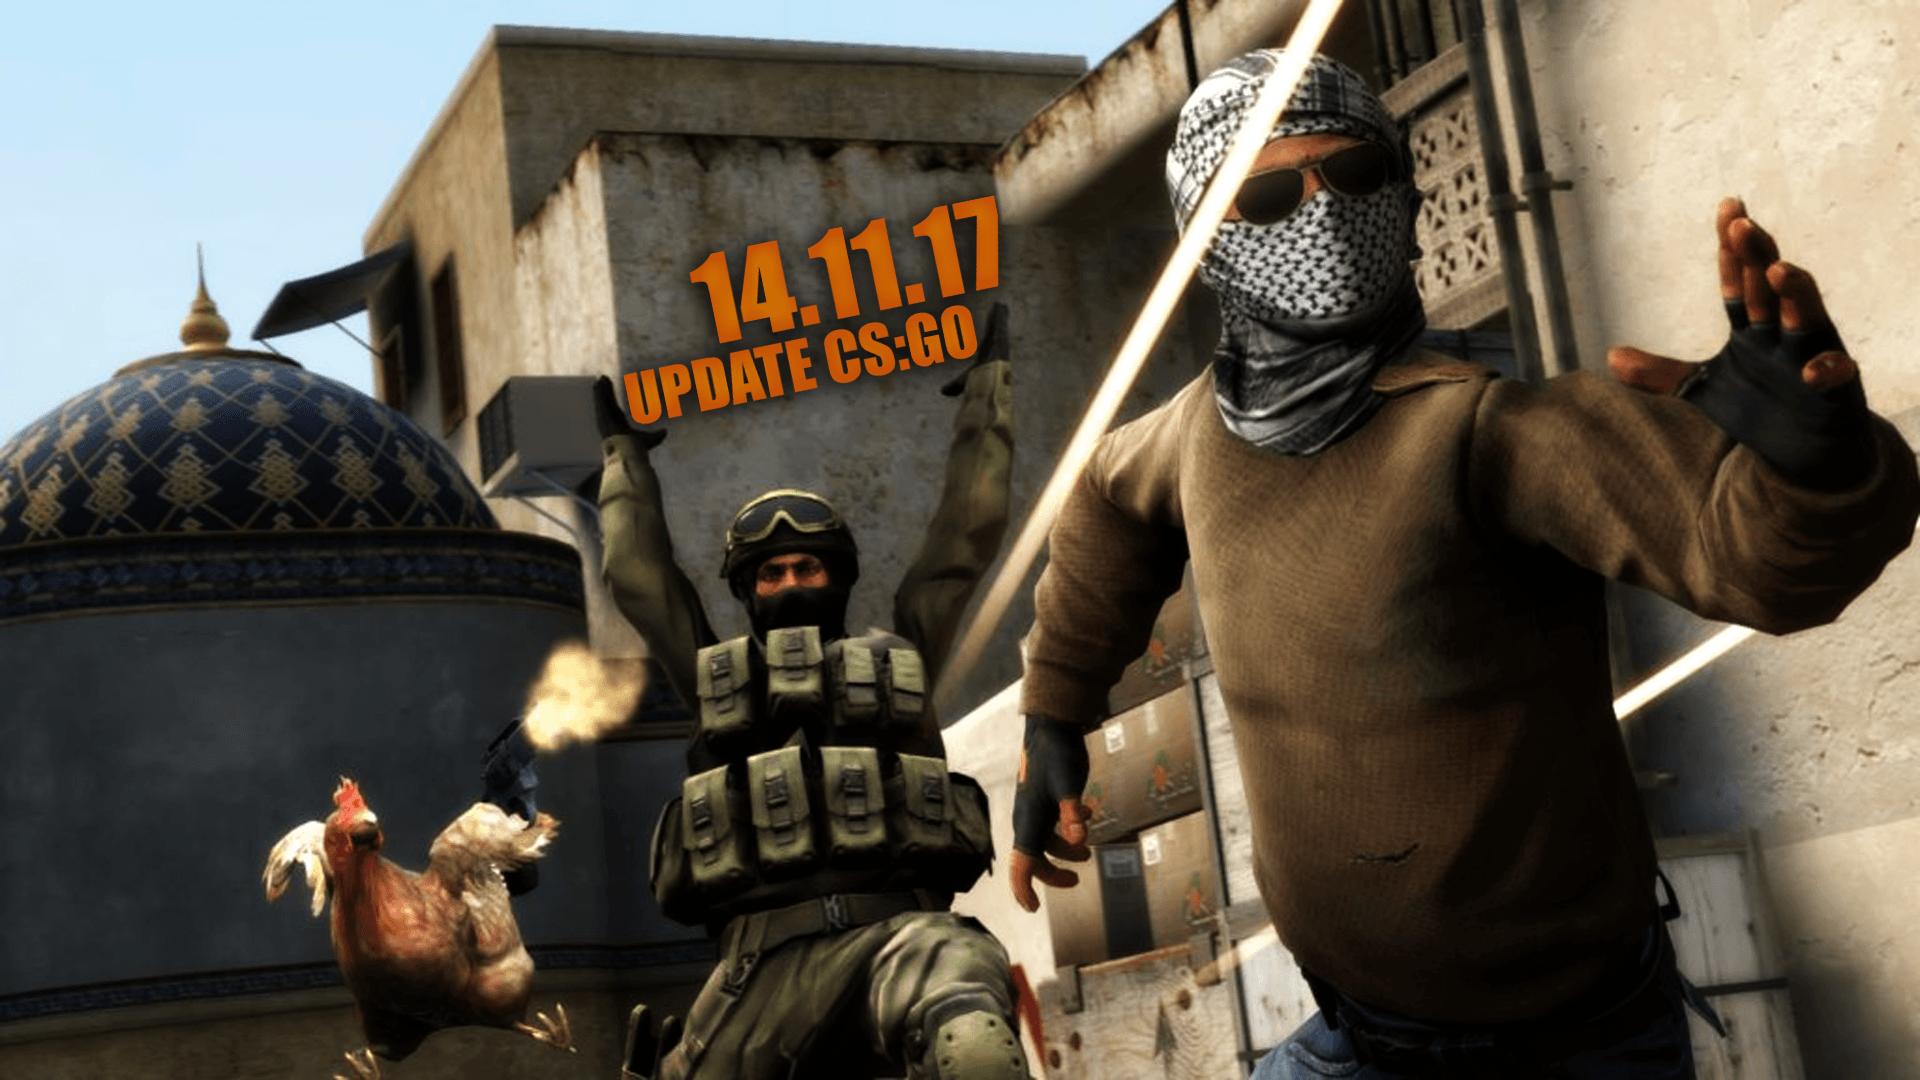 https://mmcs.pro/update-csgo-14-11-2017-valve/